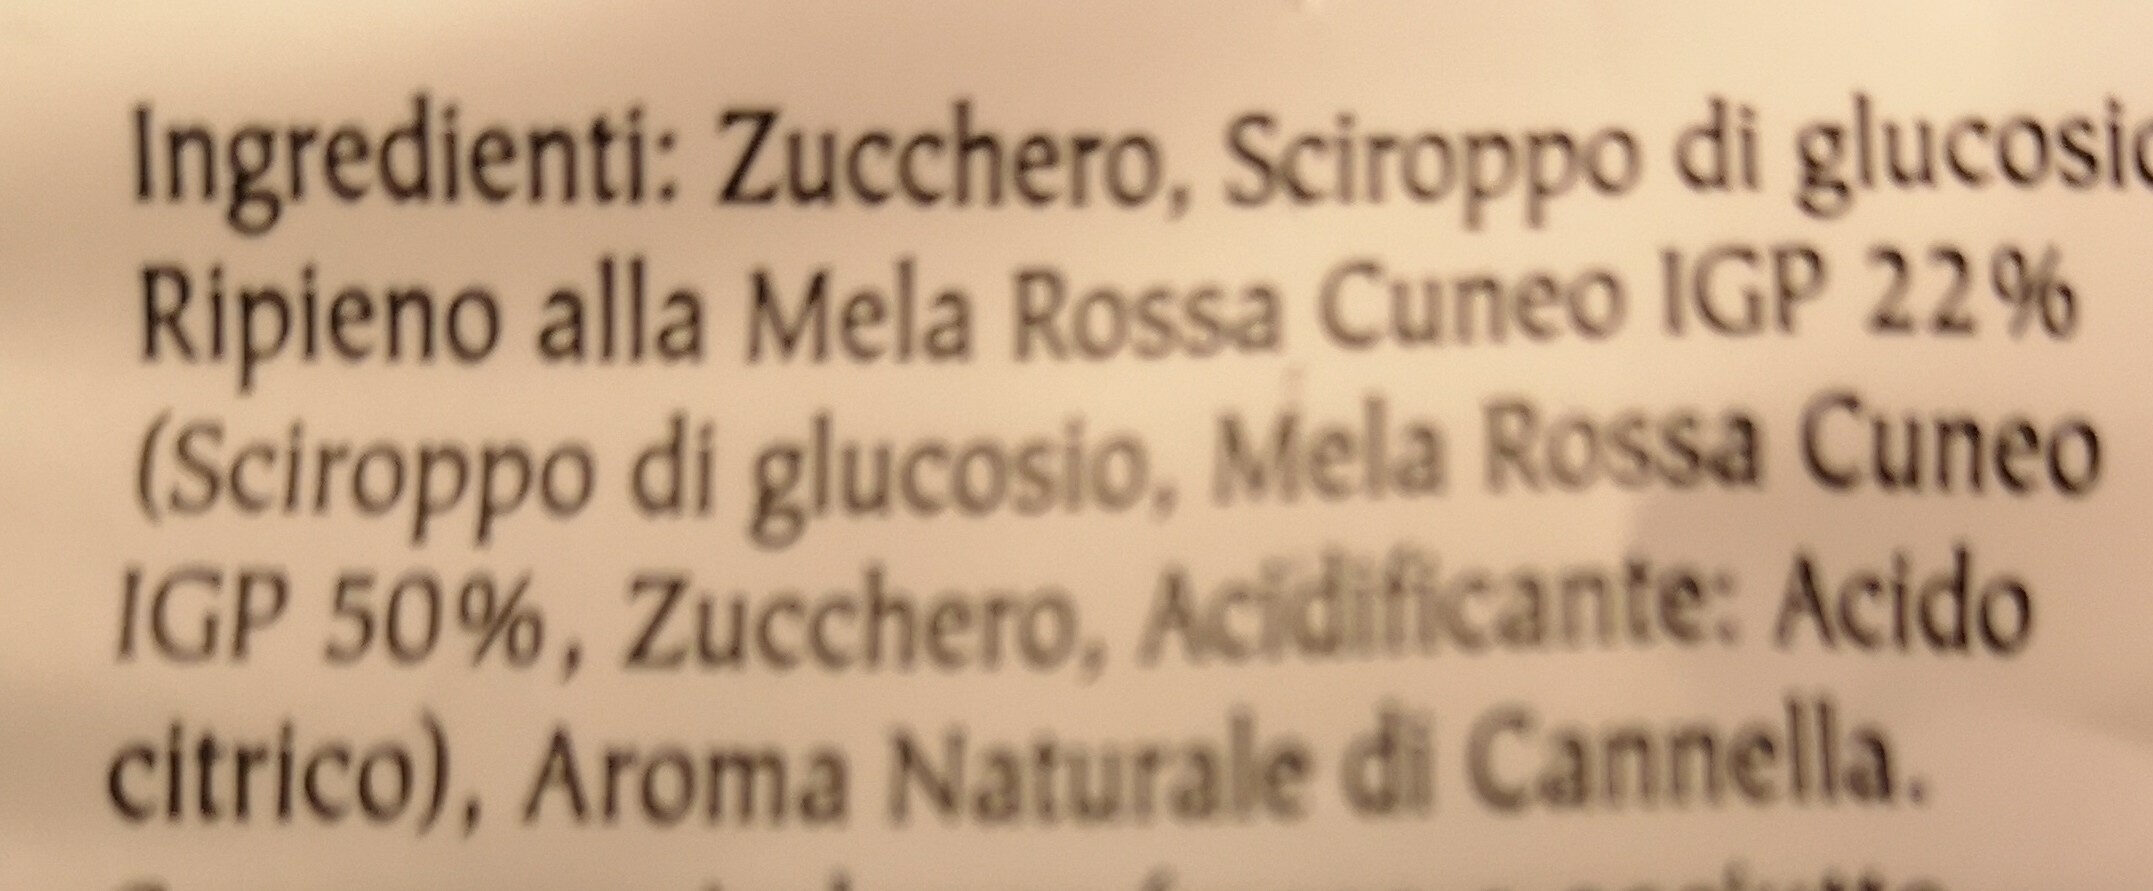 Caramelle ripiene alla mela rossa Cuneo - Ingrédients - it